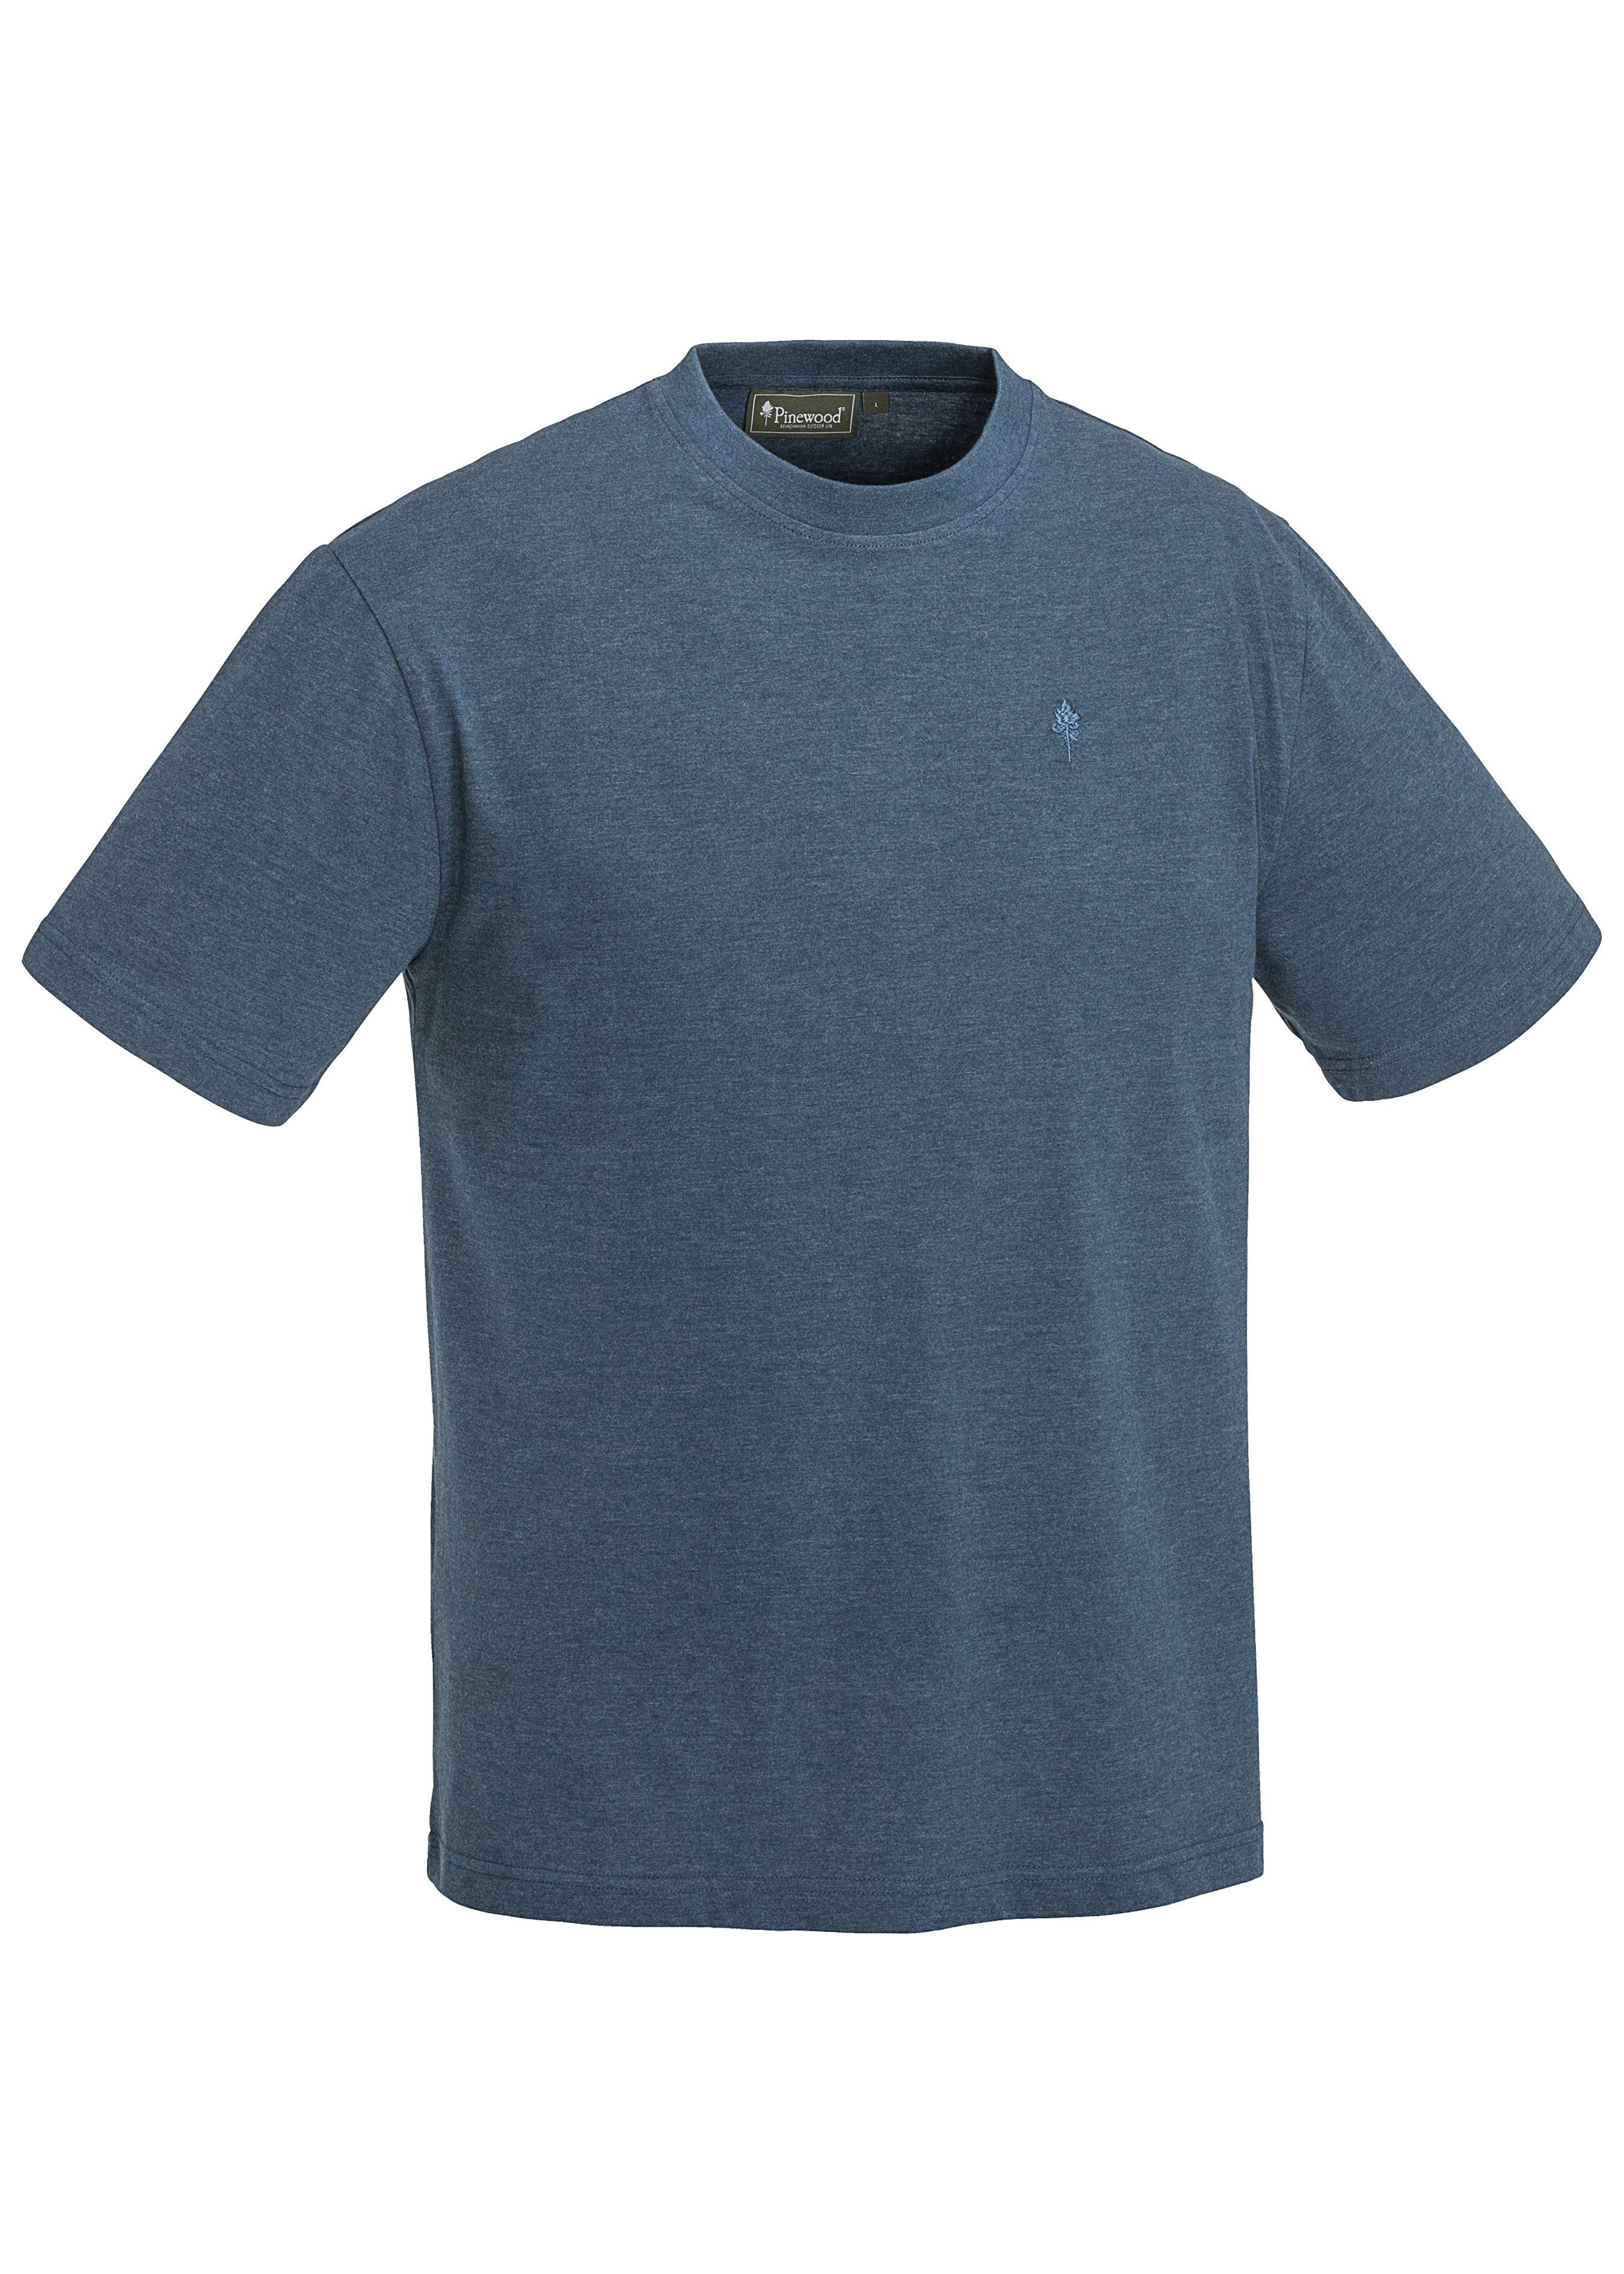 Pinewood T-Shirt im 3er-Pack 250901L 2